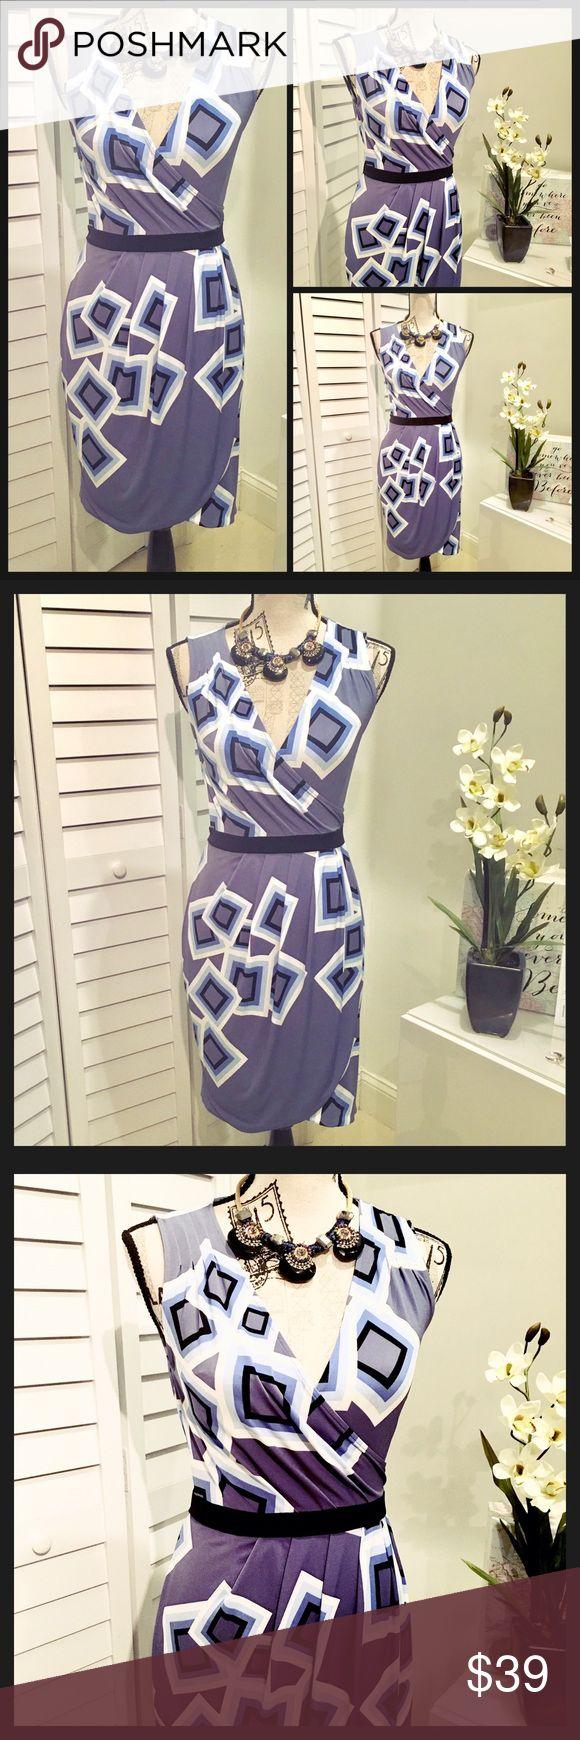 NWT Elegant geometric Print Mini Dress NWT Elegant Geometric print style Mini Dress in different tones of lavender blue, baby blue & Black, this dress is very  pretty & stylish 👗it is right above the knee. New York & Company Dresses Mini